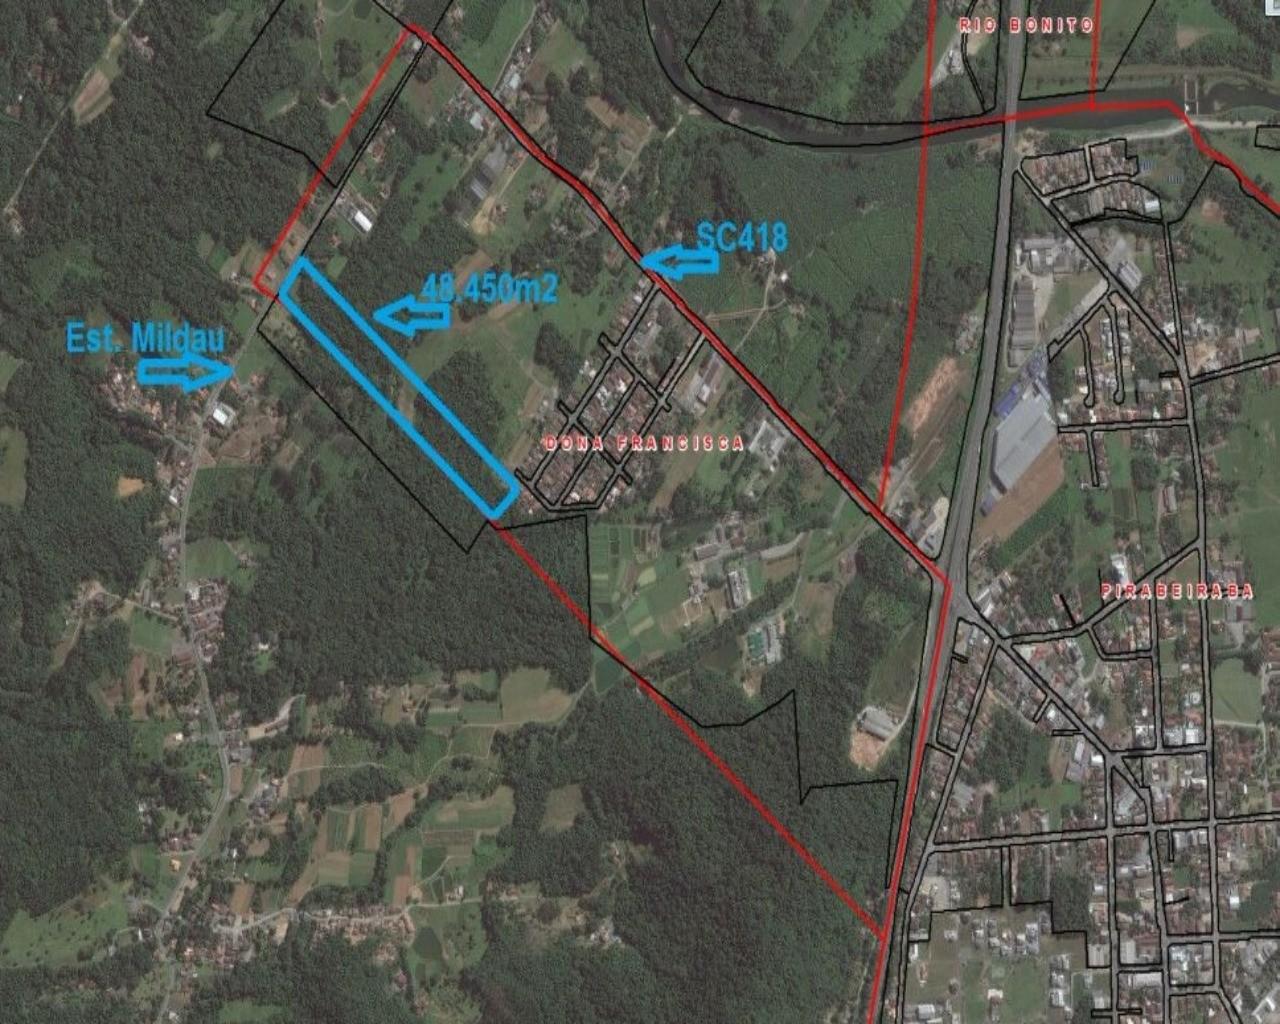 Terreno/Lote à venda  no Pirabeiraba (Pirabeiraba) - Joinville, SC. Imóveis